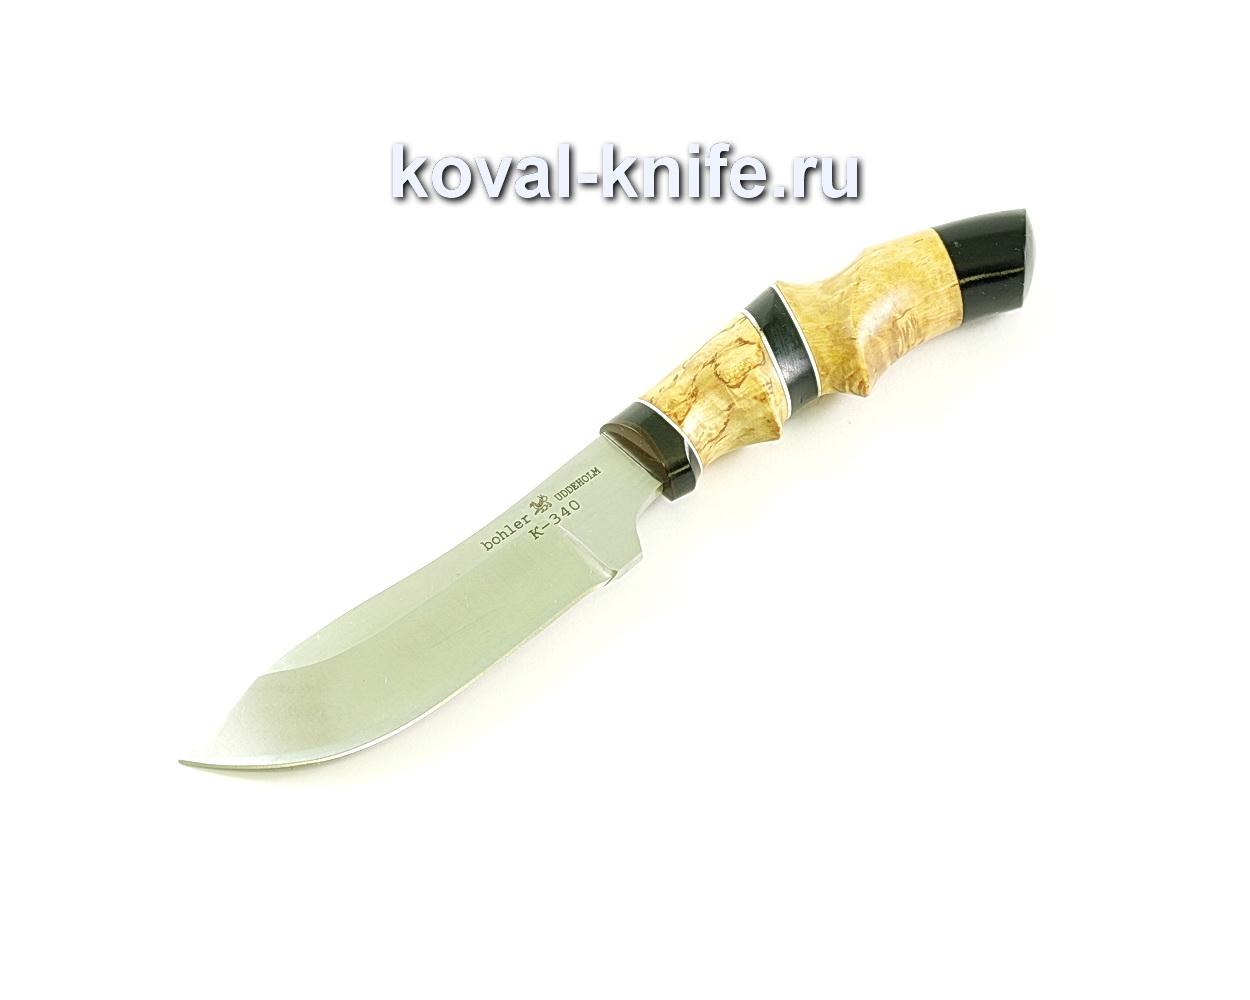 Нож Кабан (сталь K-340), рукоять эбонит, карелка A112